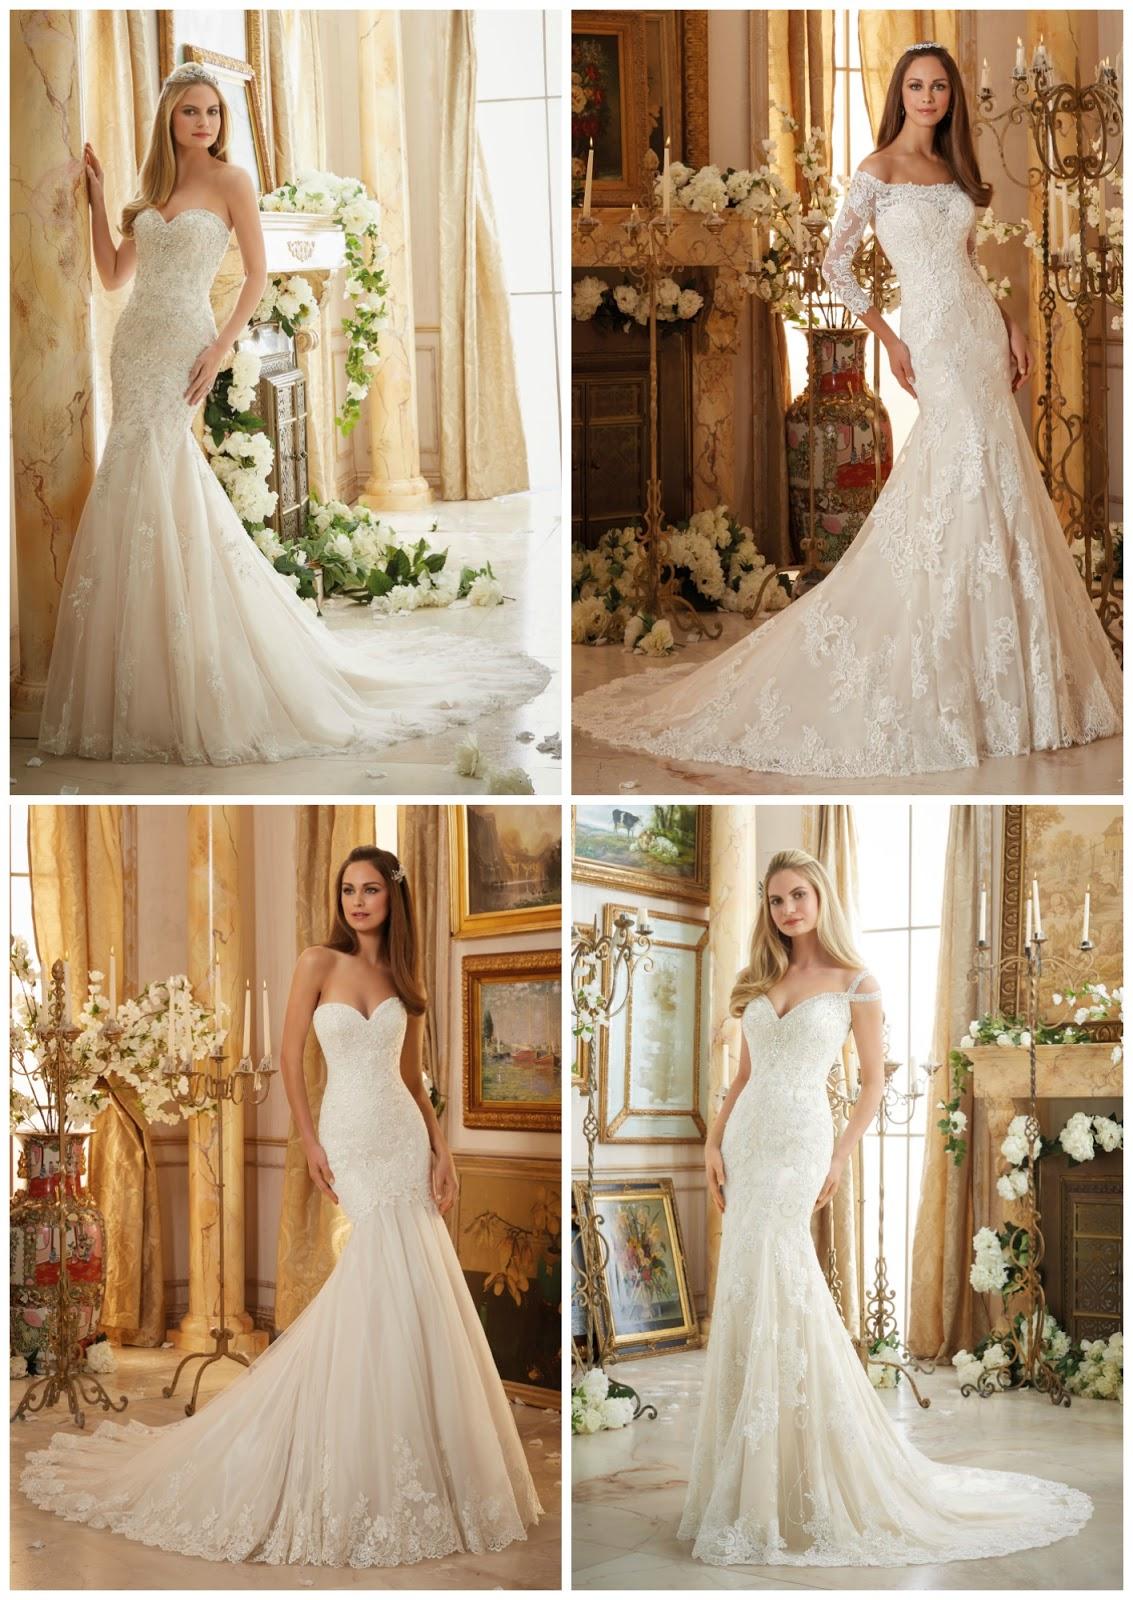 Brides of America Online Store: 2016